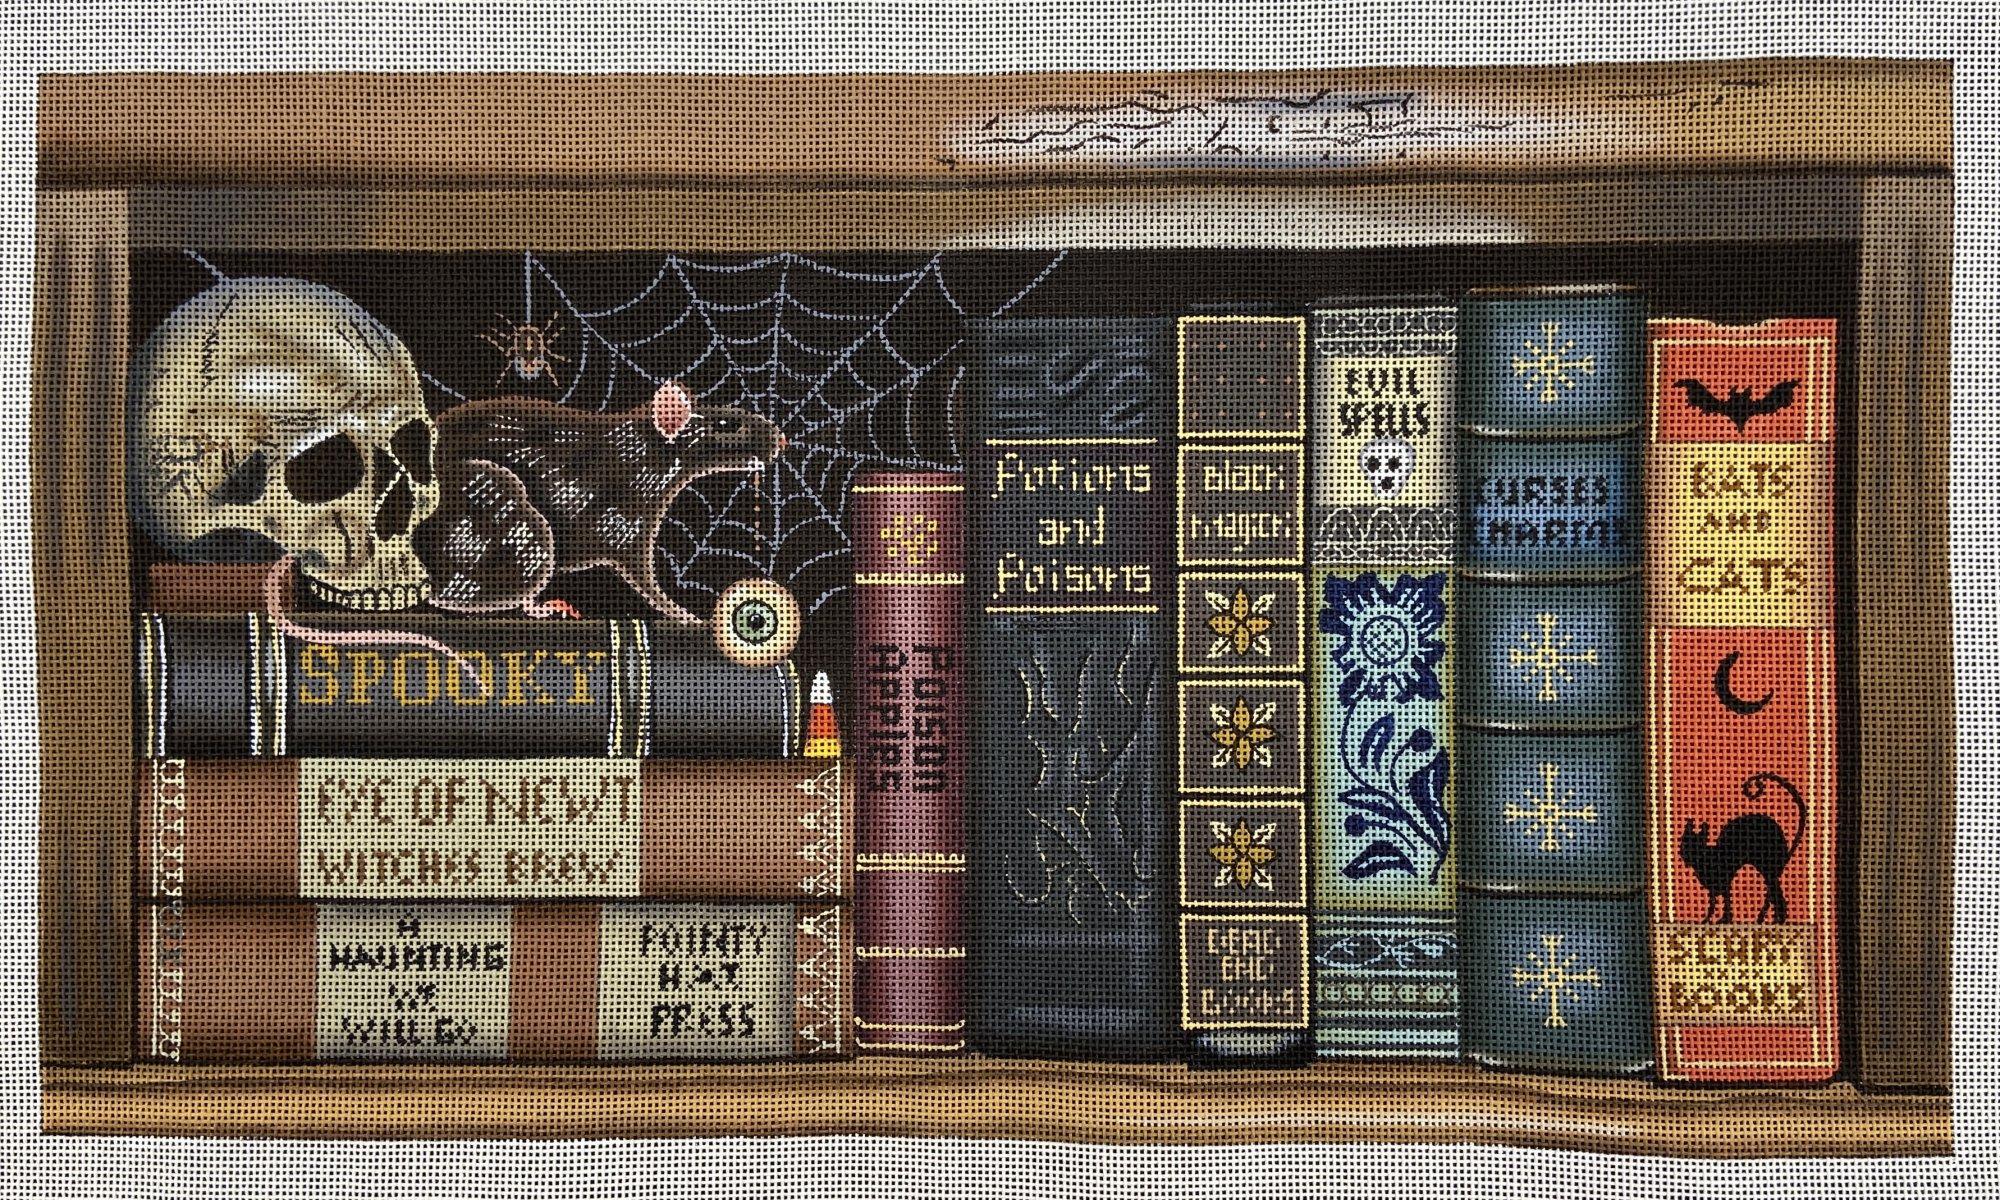 MS2057 Shelf of Witch's Halloween Books Melissa Shirley